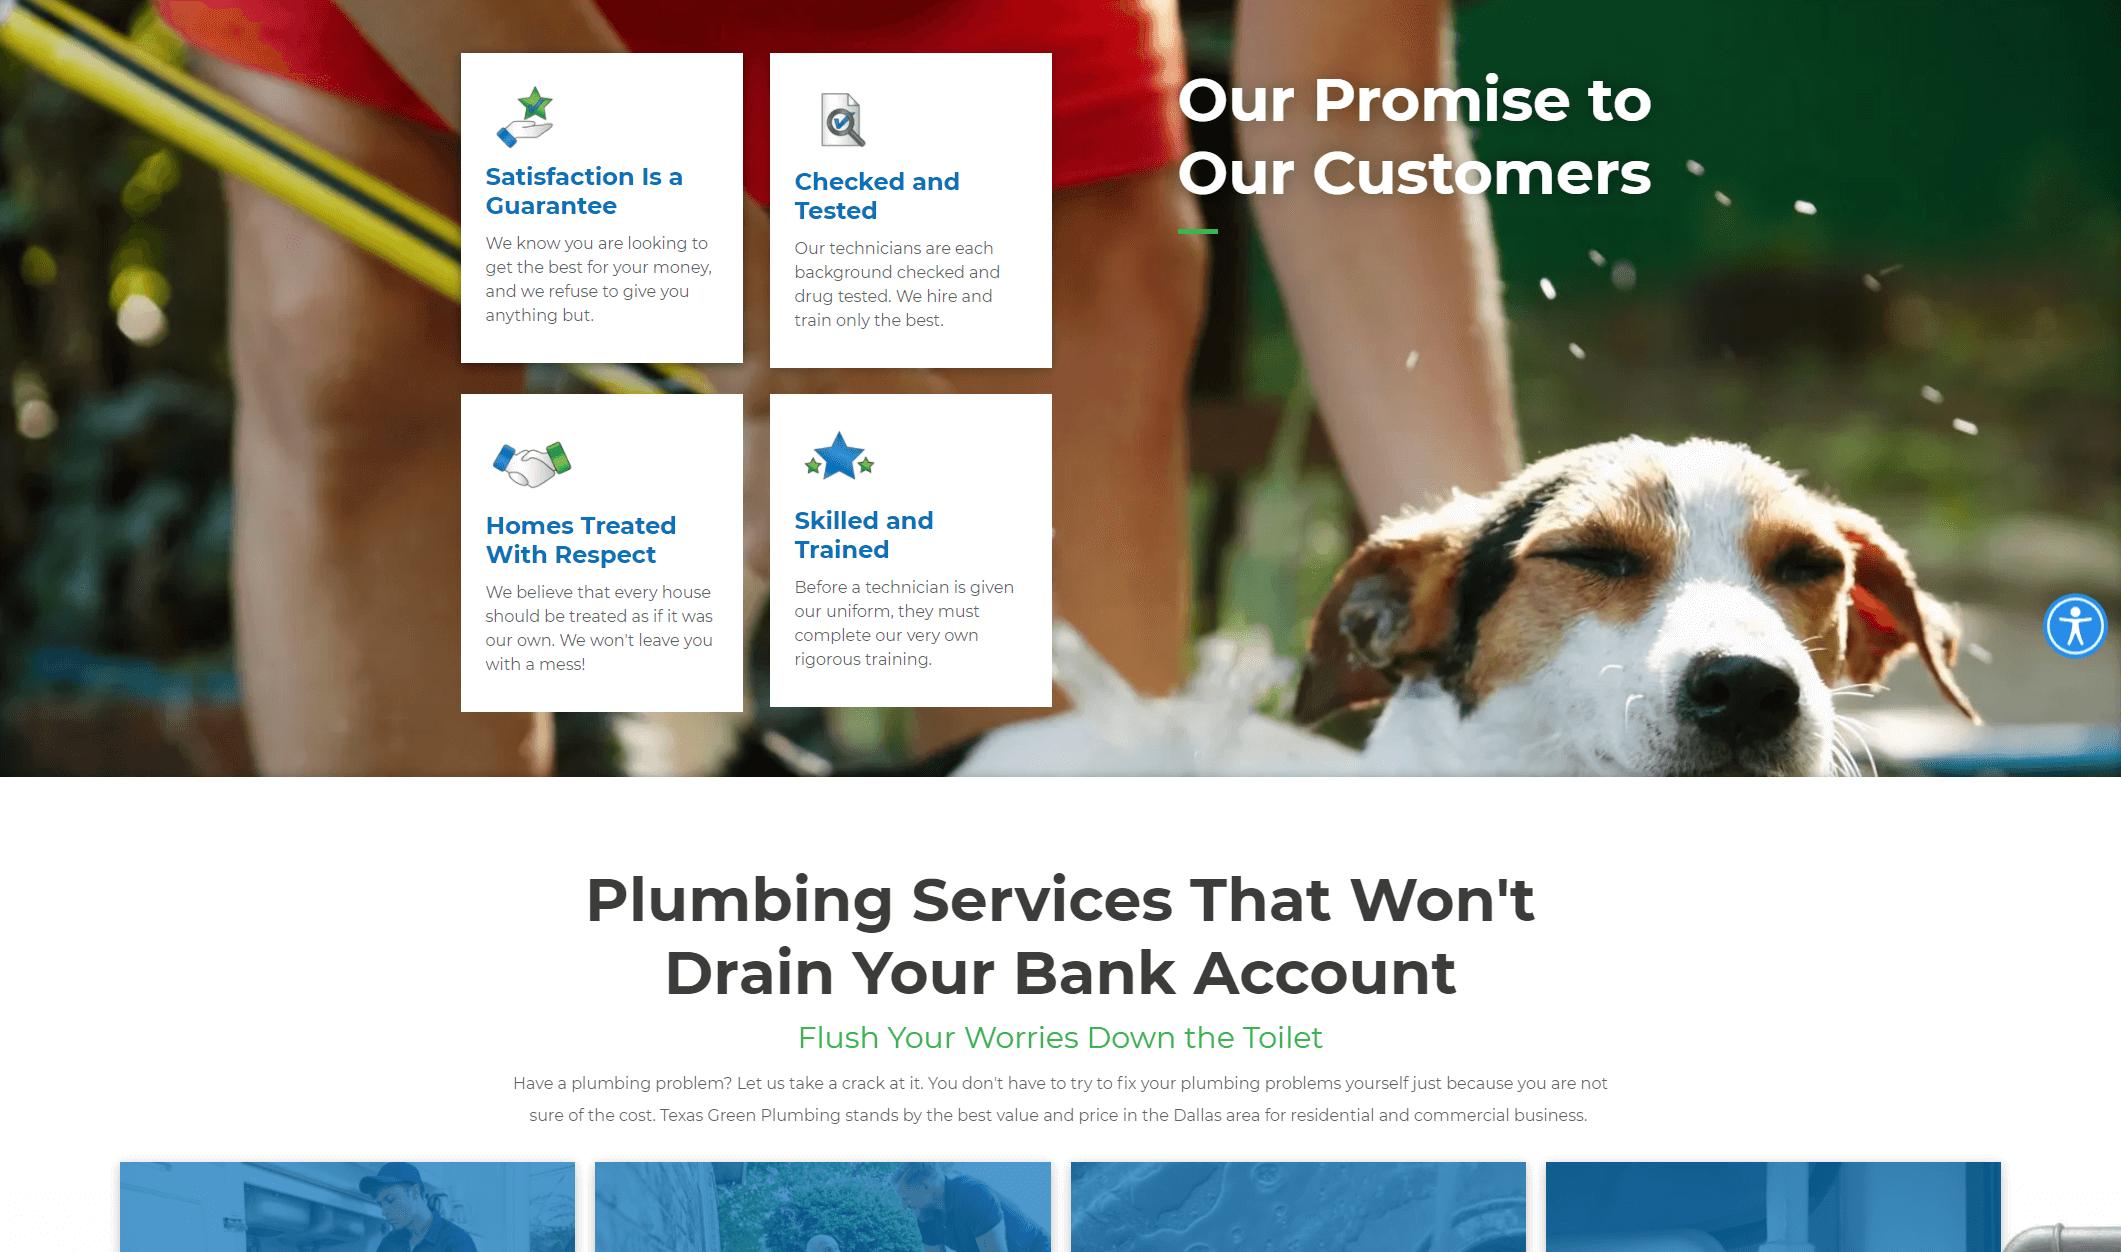 www.texasgreenplumbing.com-2